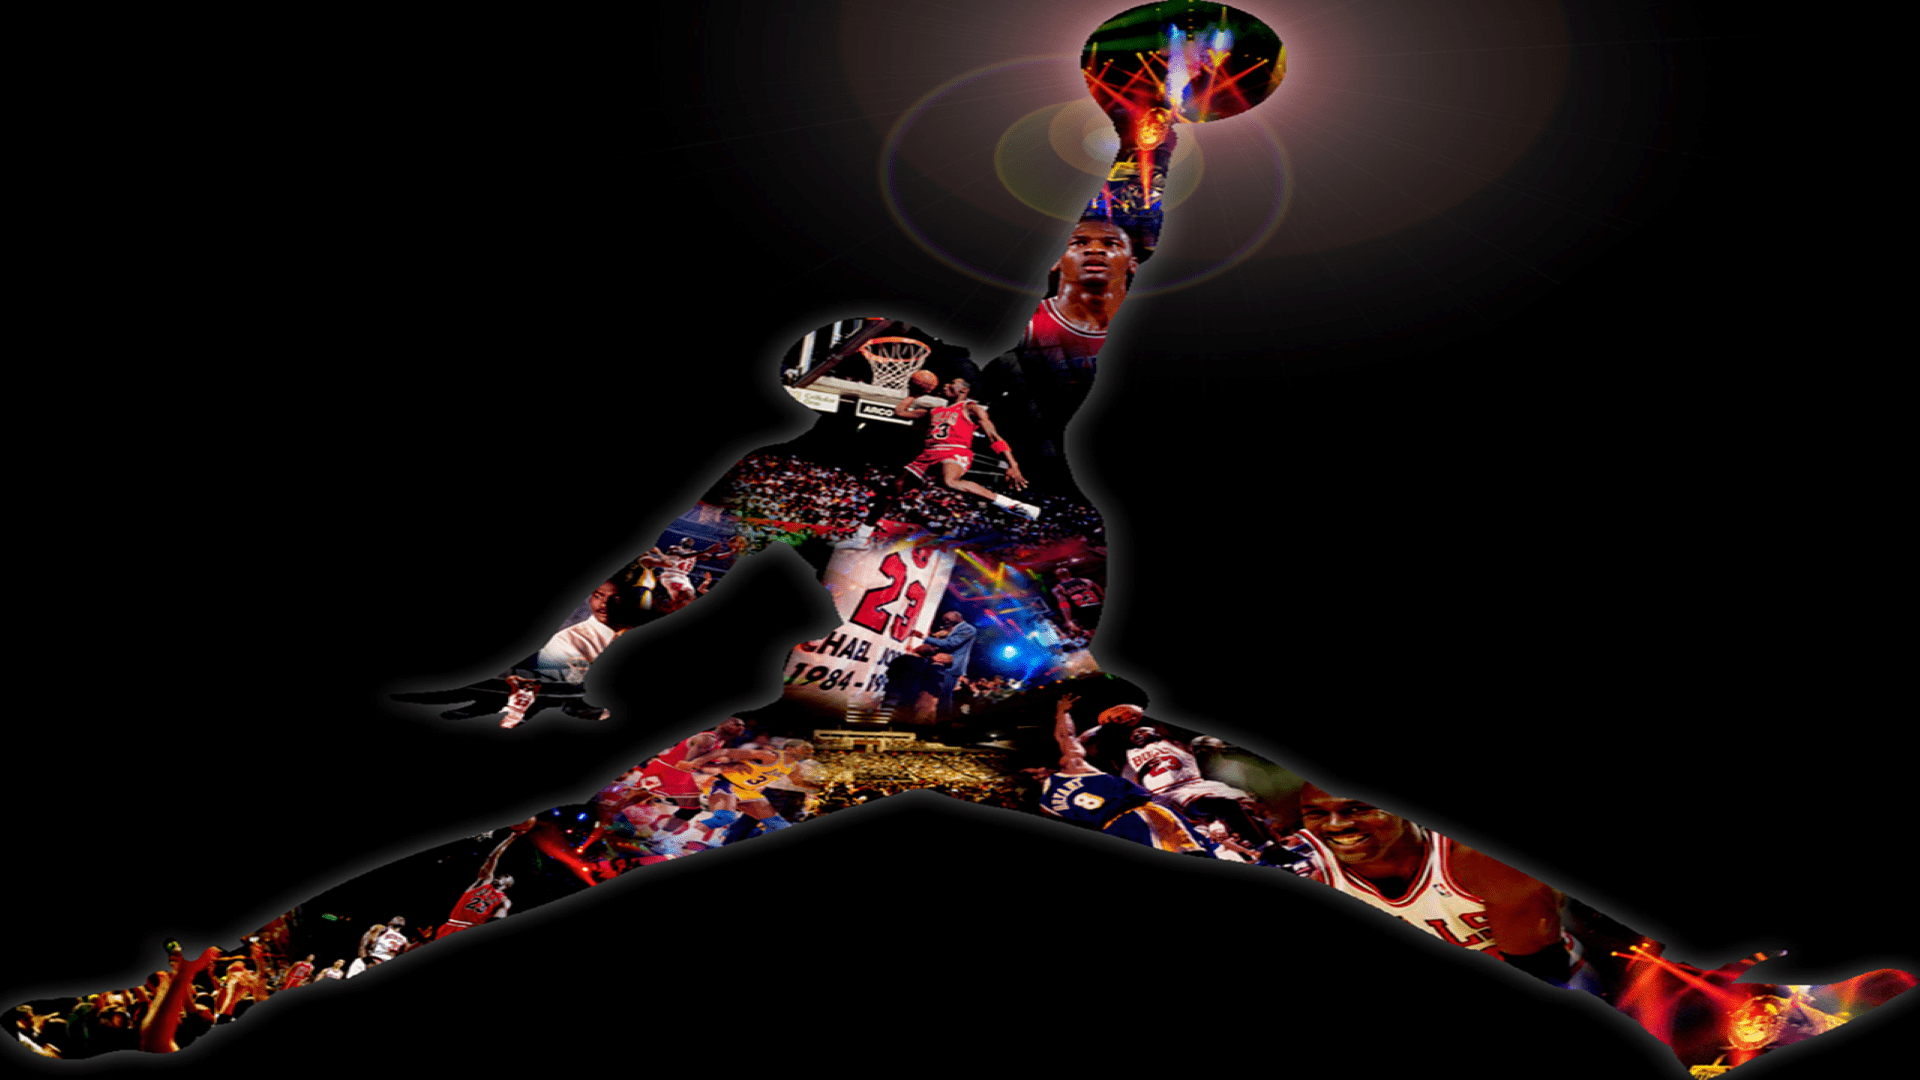 Michael Jordan Wallpaper For Mobile Phone Tablet Desktop Computer And Other Devices Hd And 4k Wallp In 2020 Michael Jordan Pictures Jordan Logo Wallpaper Jordan Logo